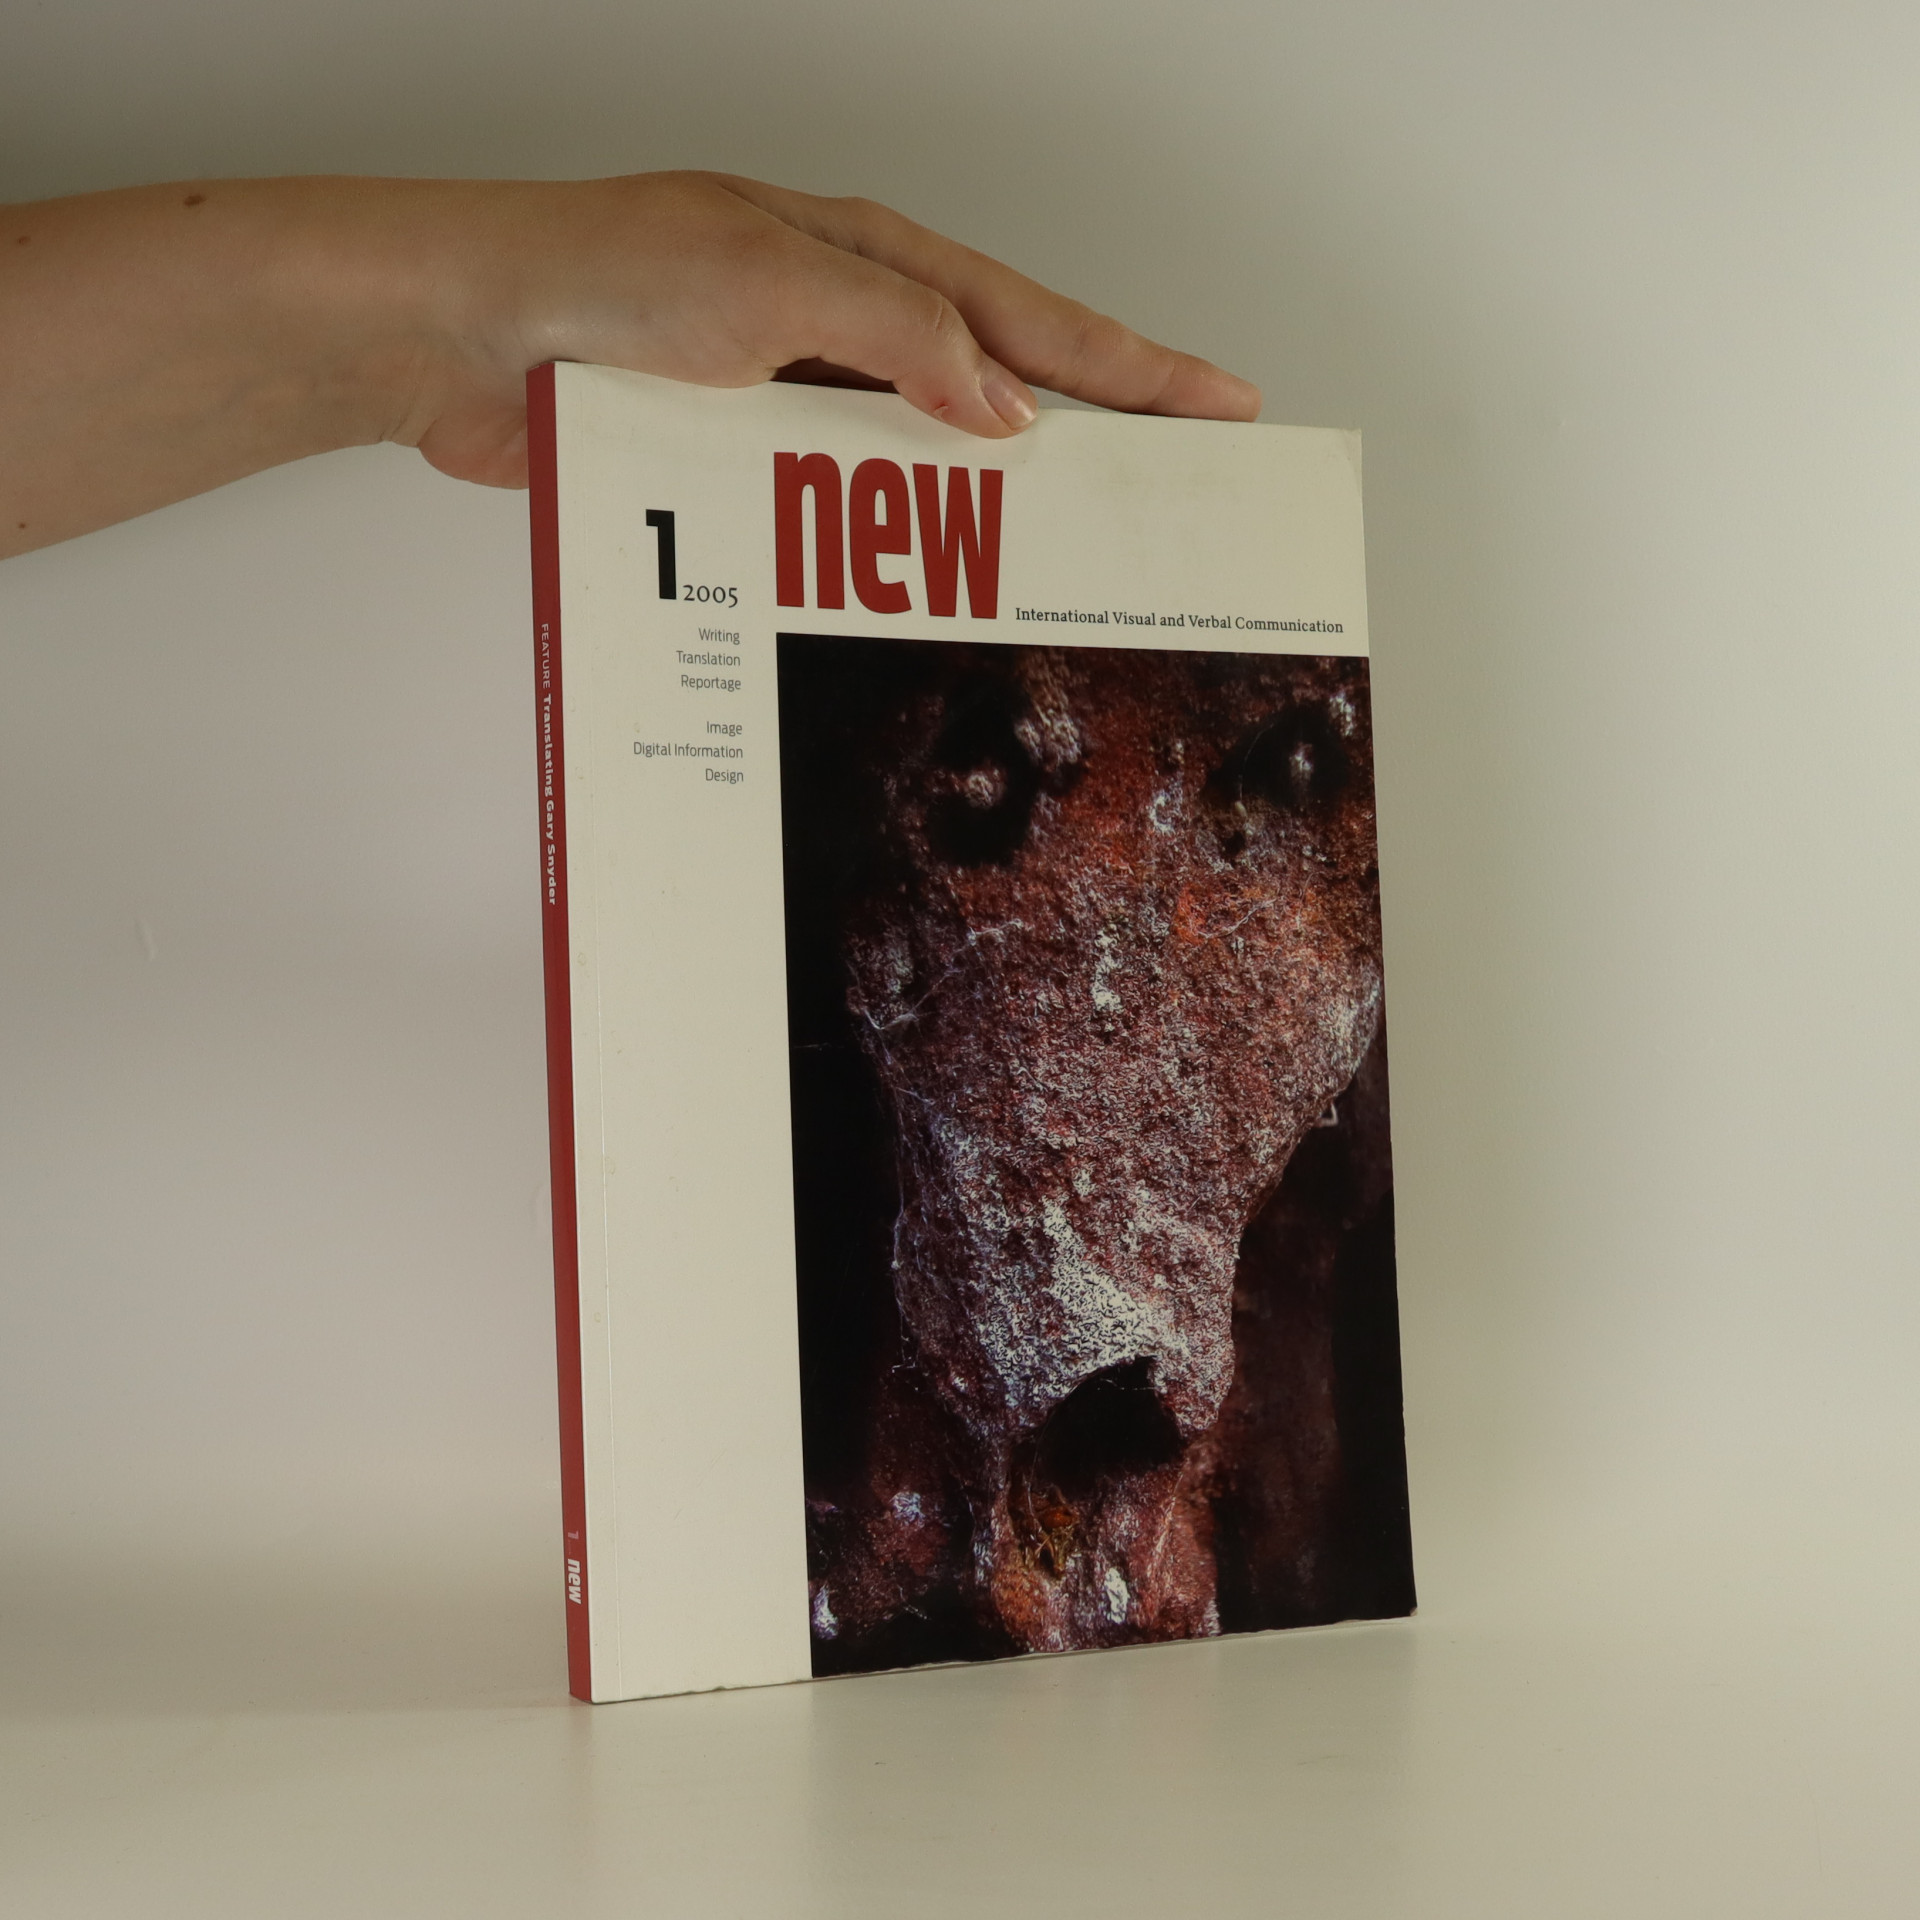 antikvární kniha New. International Visual and Verbal Communication (Issue 1, 2005), neuveden